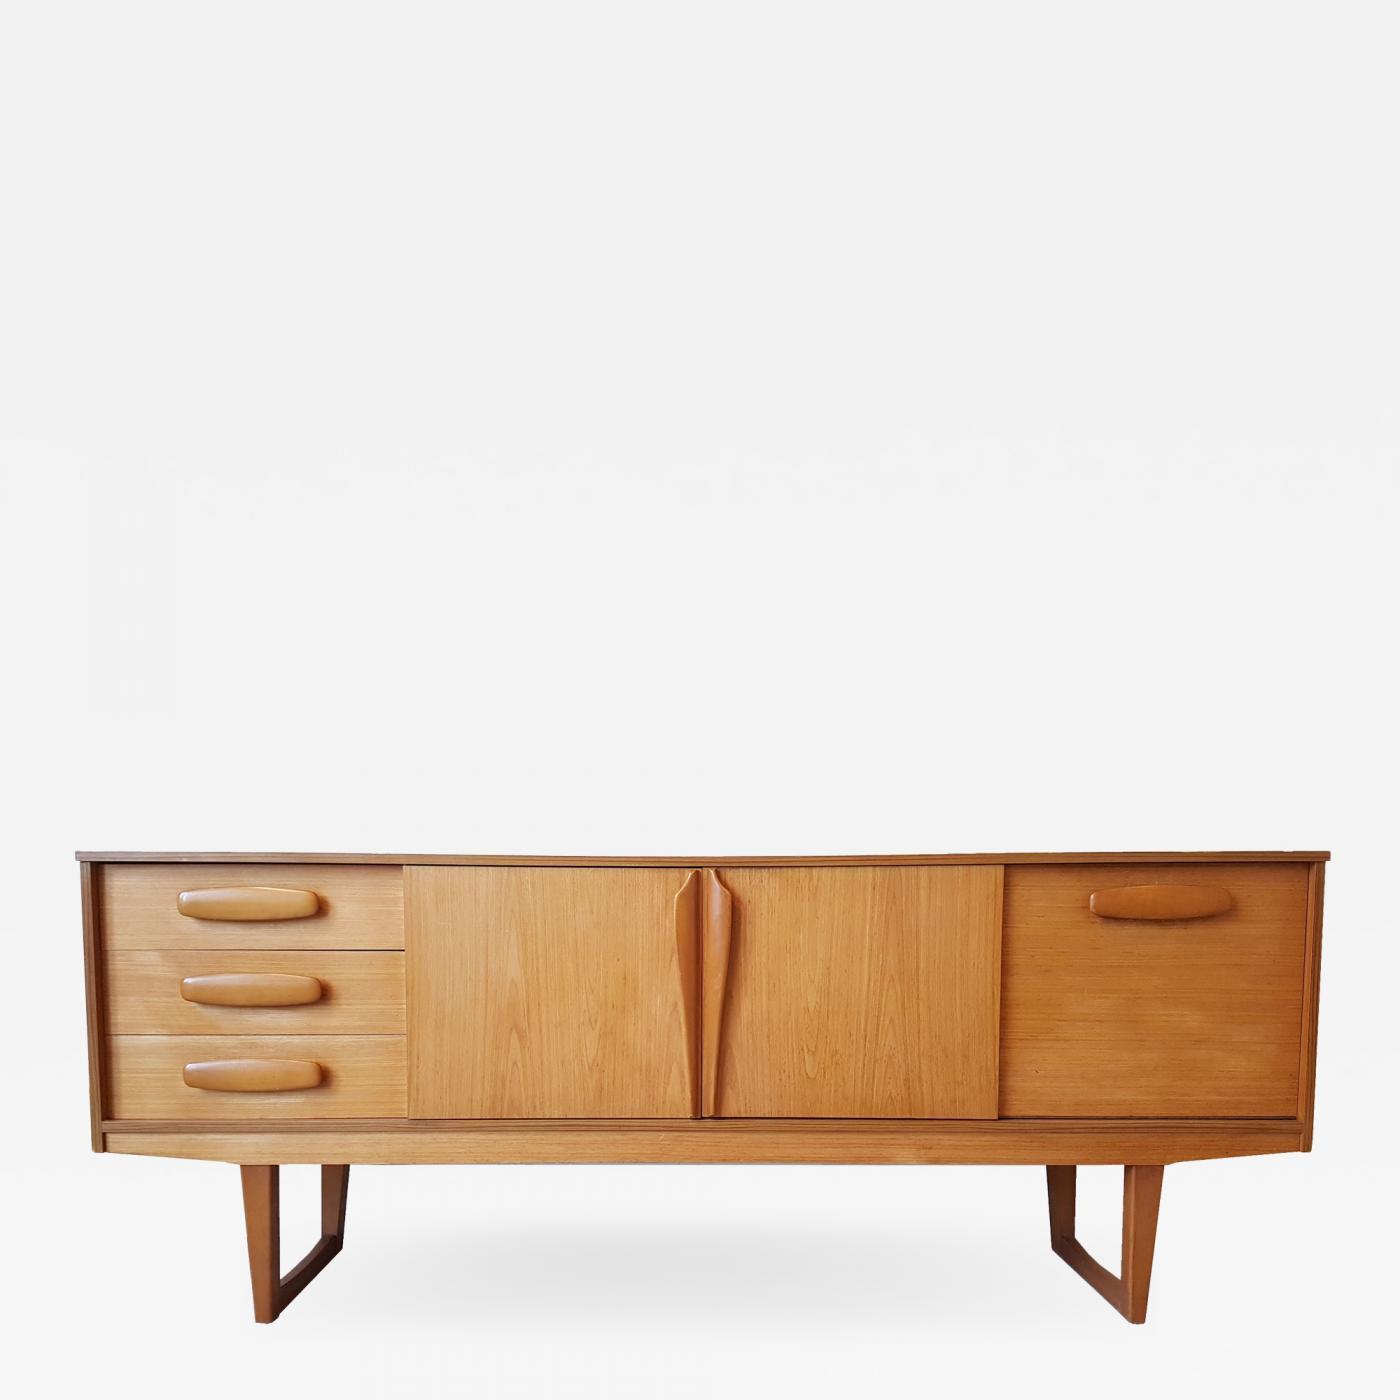 Mid Century Modern Danish Sideboard Or Credenza In Cherry Wood Denmark 1960s